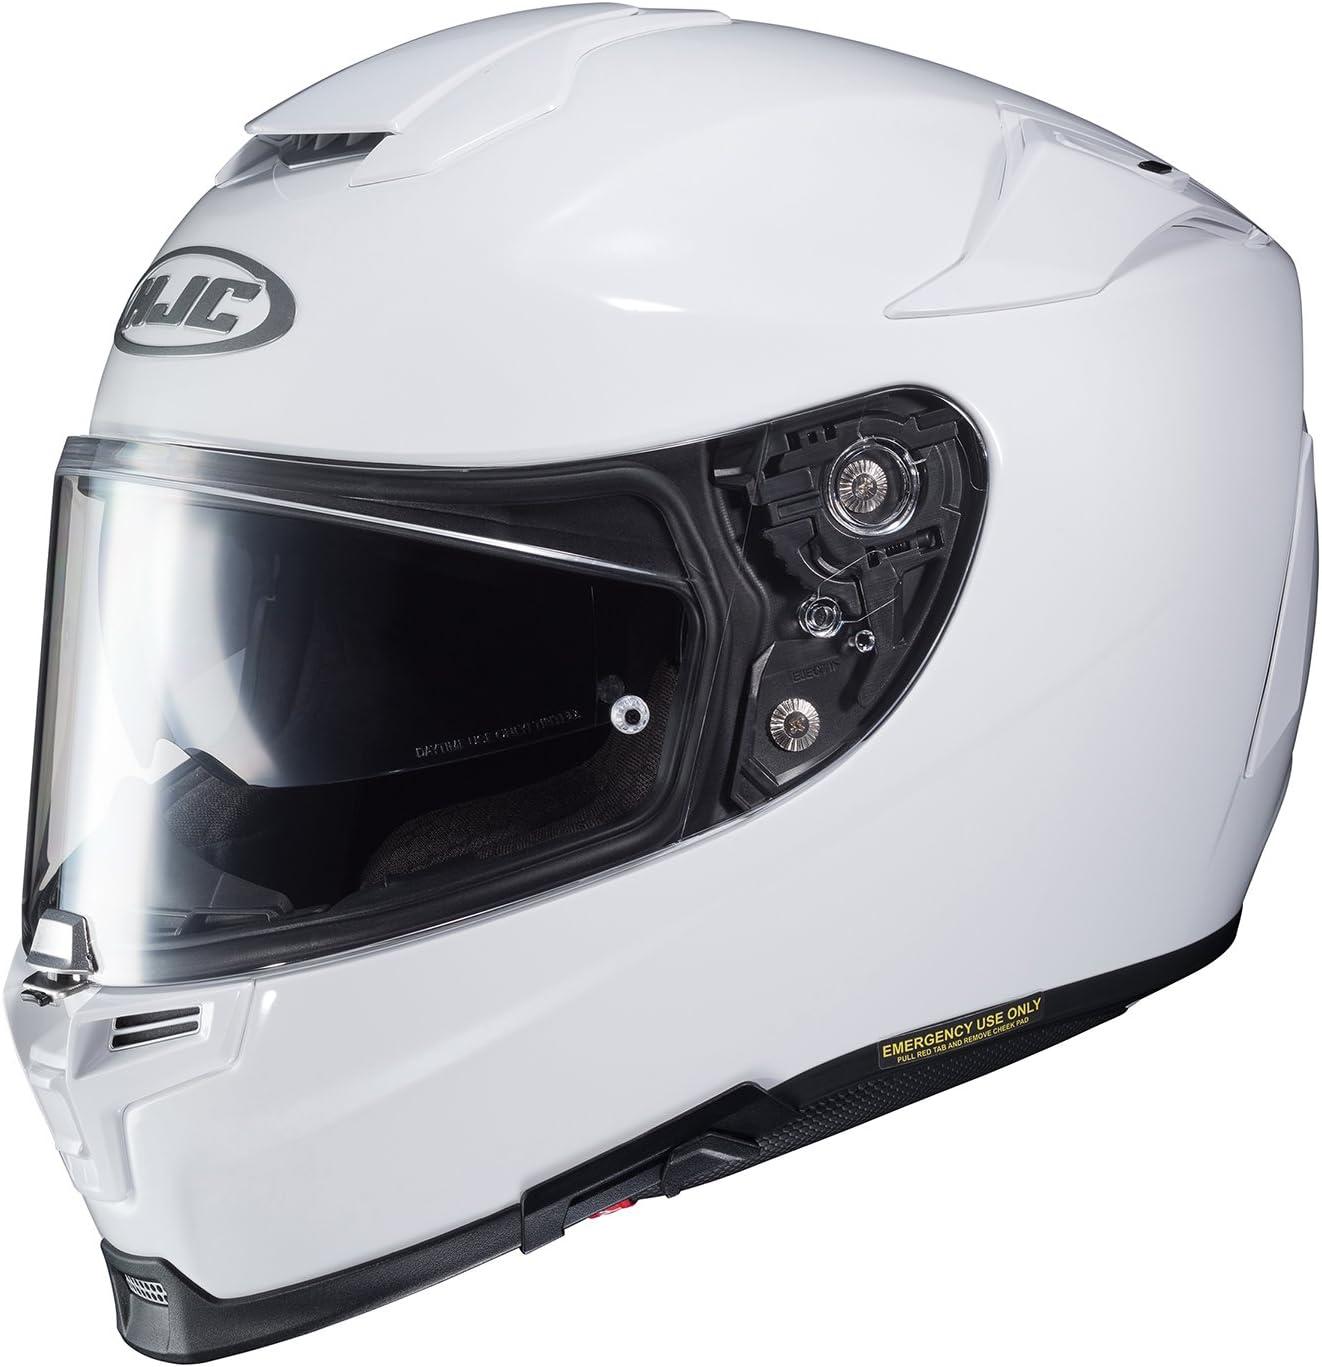 HJC Helmets 1690-634 Matte Black Large RPHA-70 ST Helmet